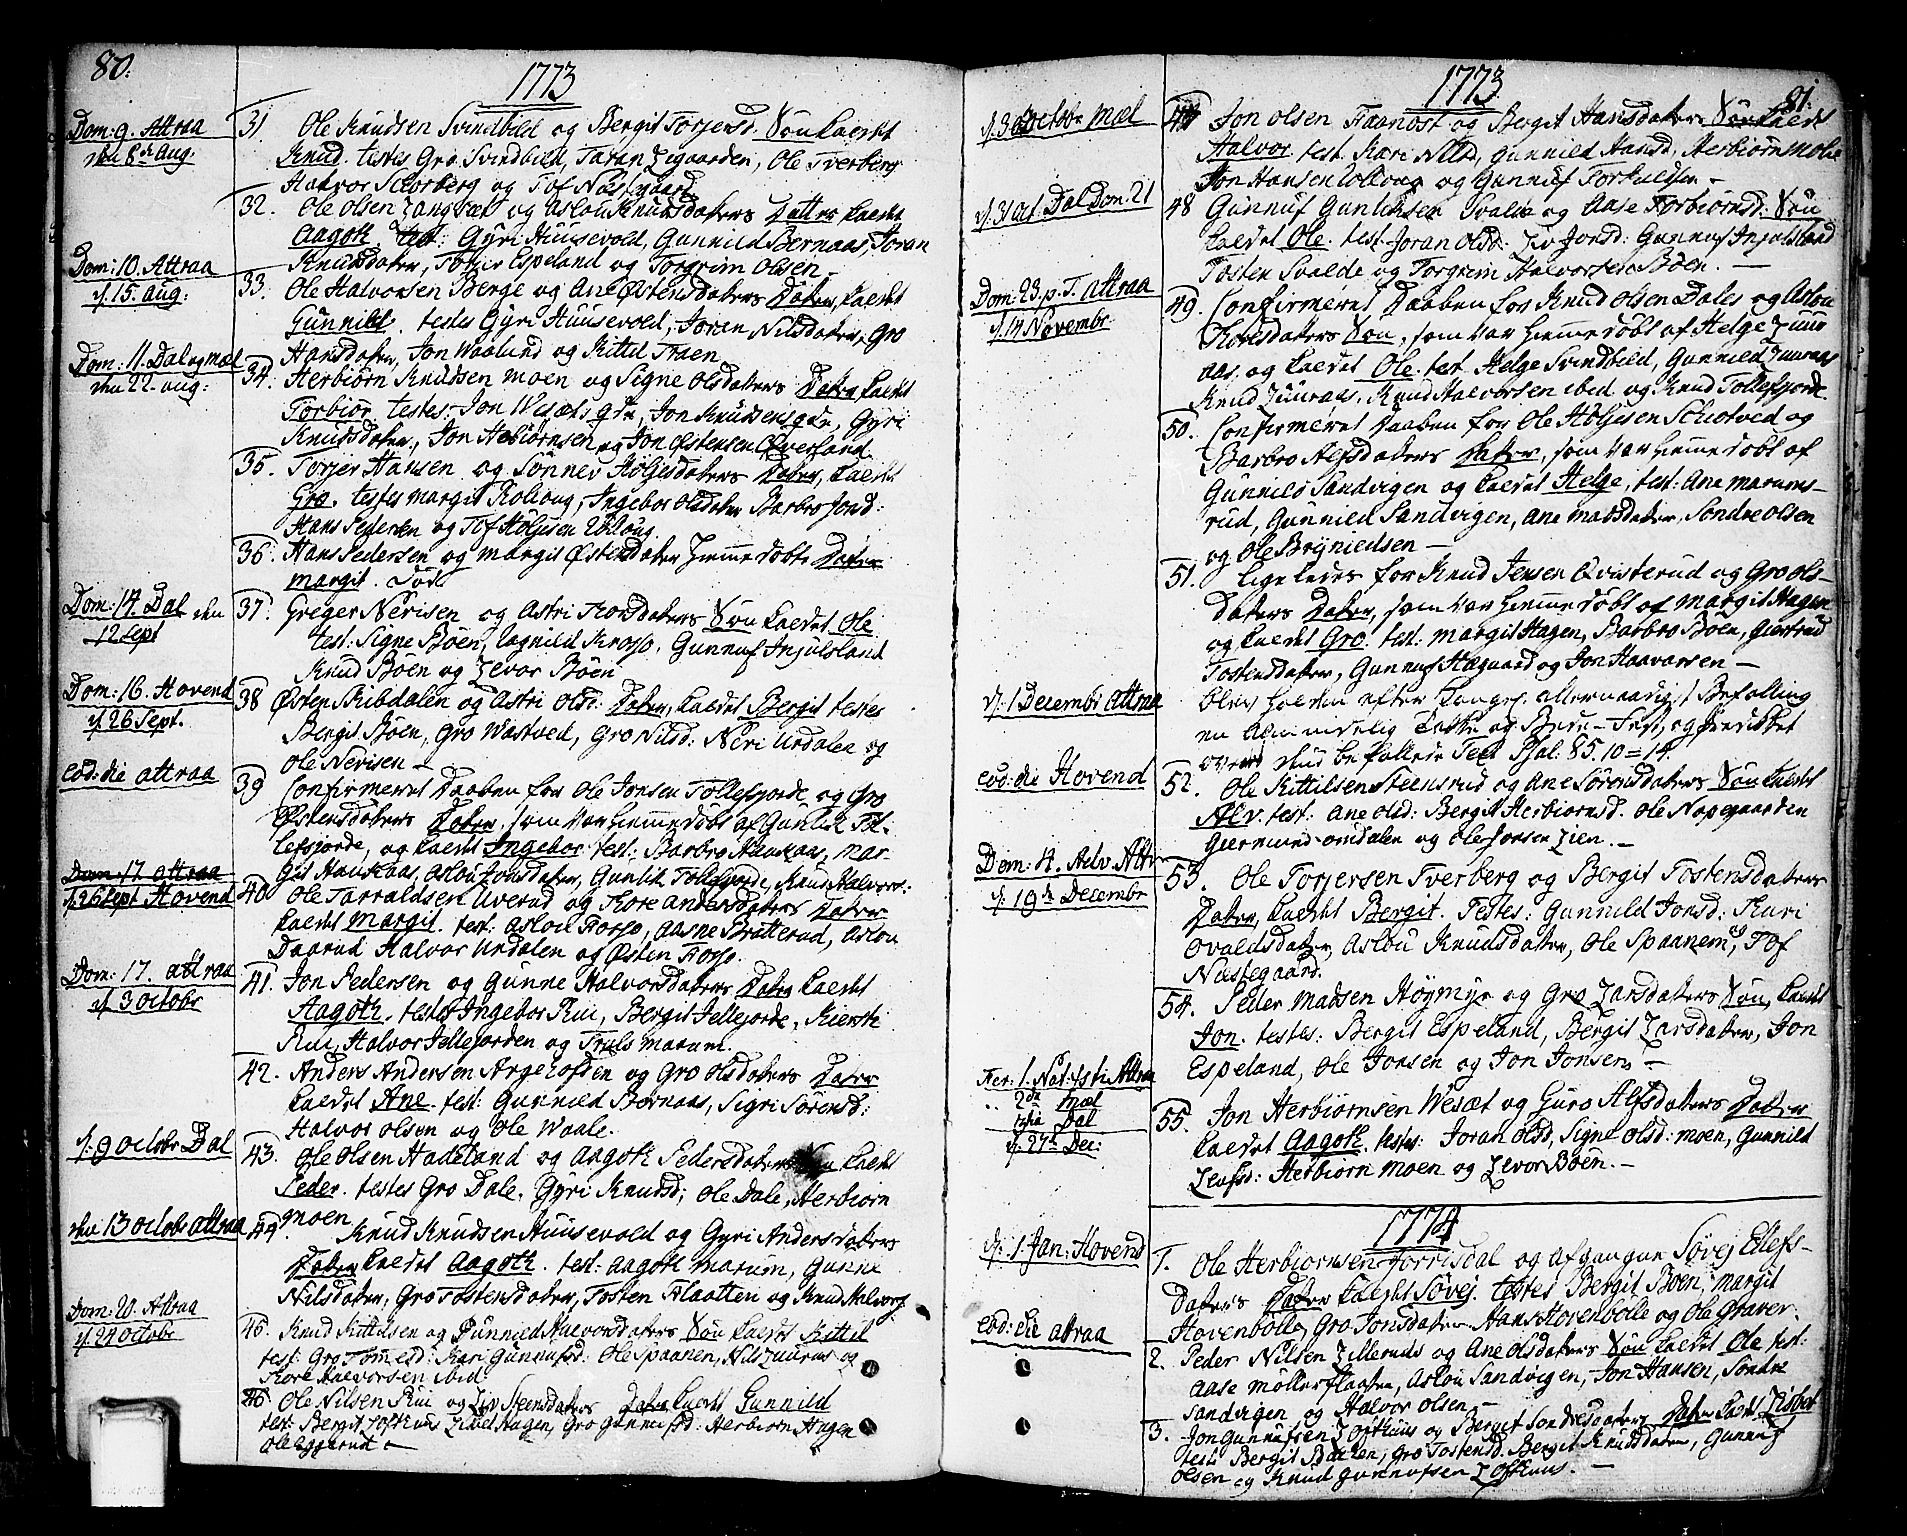 SAKO, Tinn kirkebøker, F/Fa/L0002: Ministerialbok nr. I 2, 1757-1810, s. 80-81